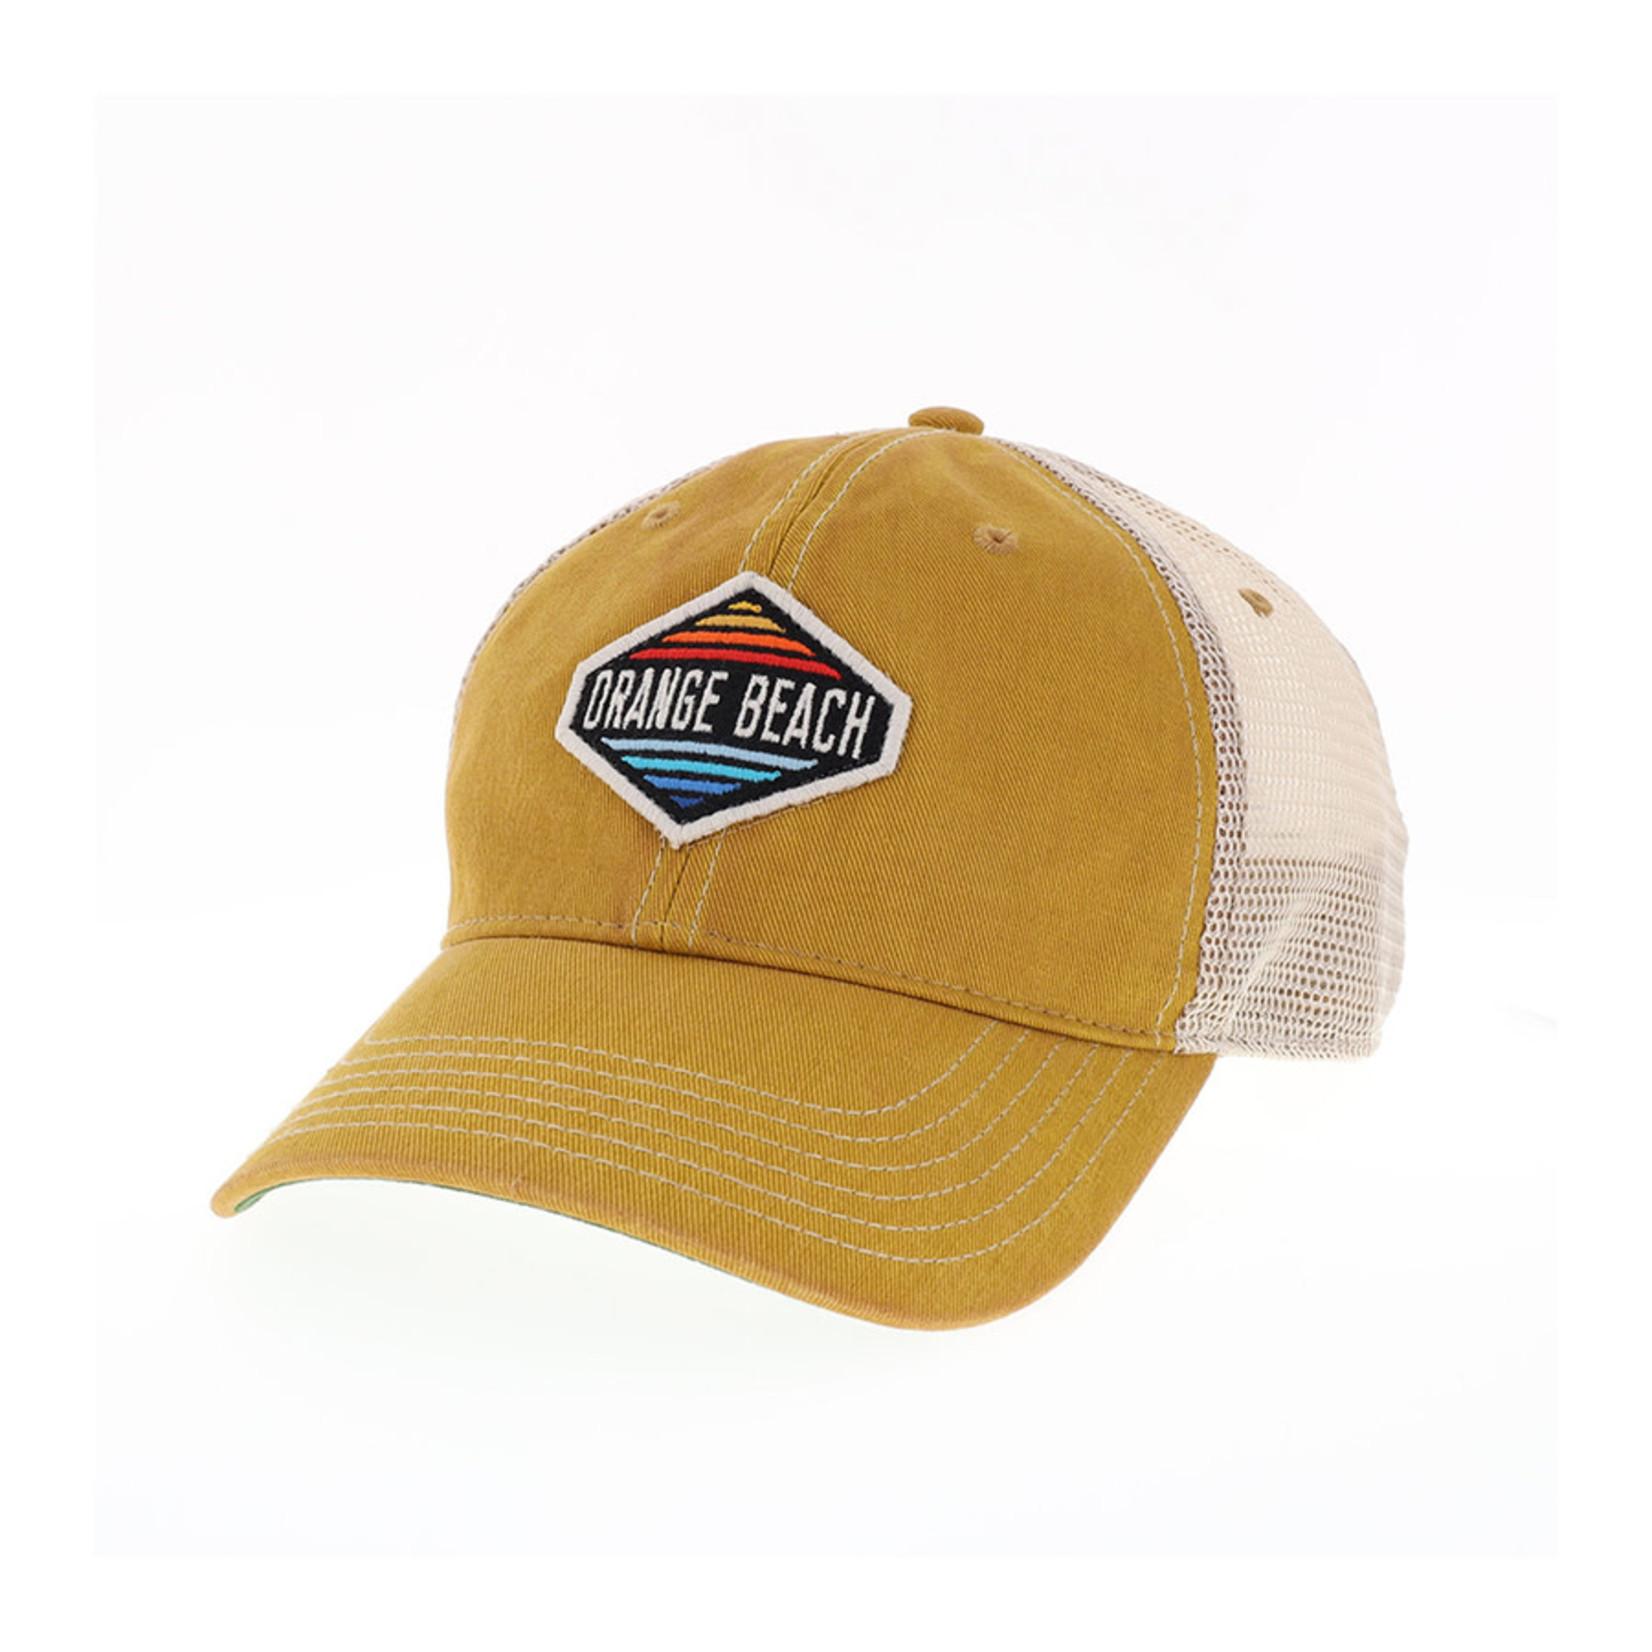 L2 Brands The Diamond Old Favorite